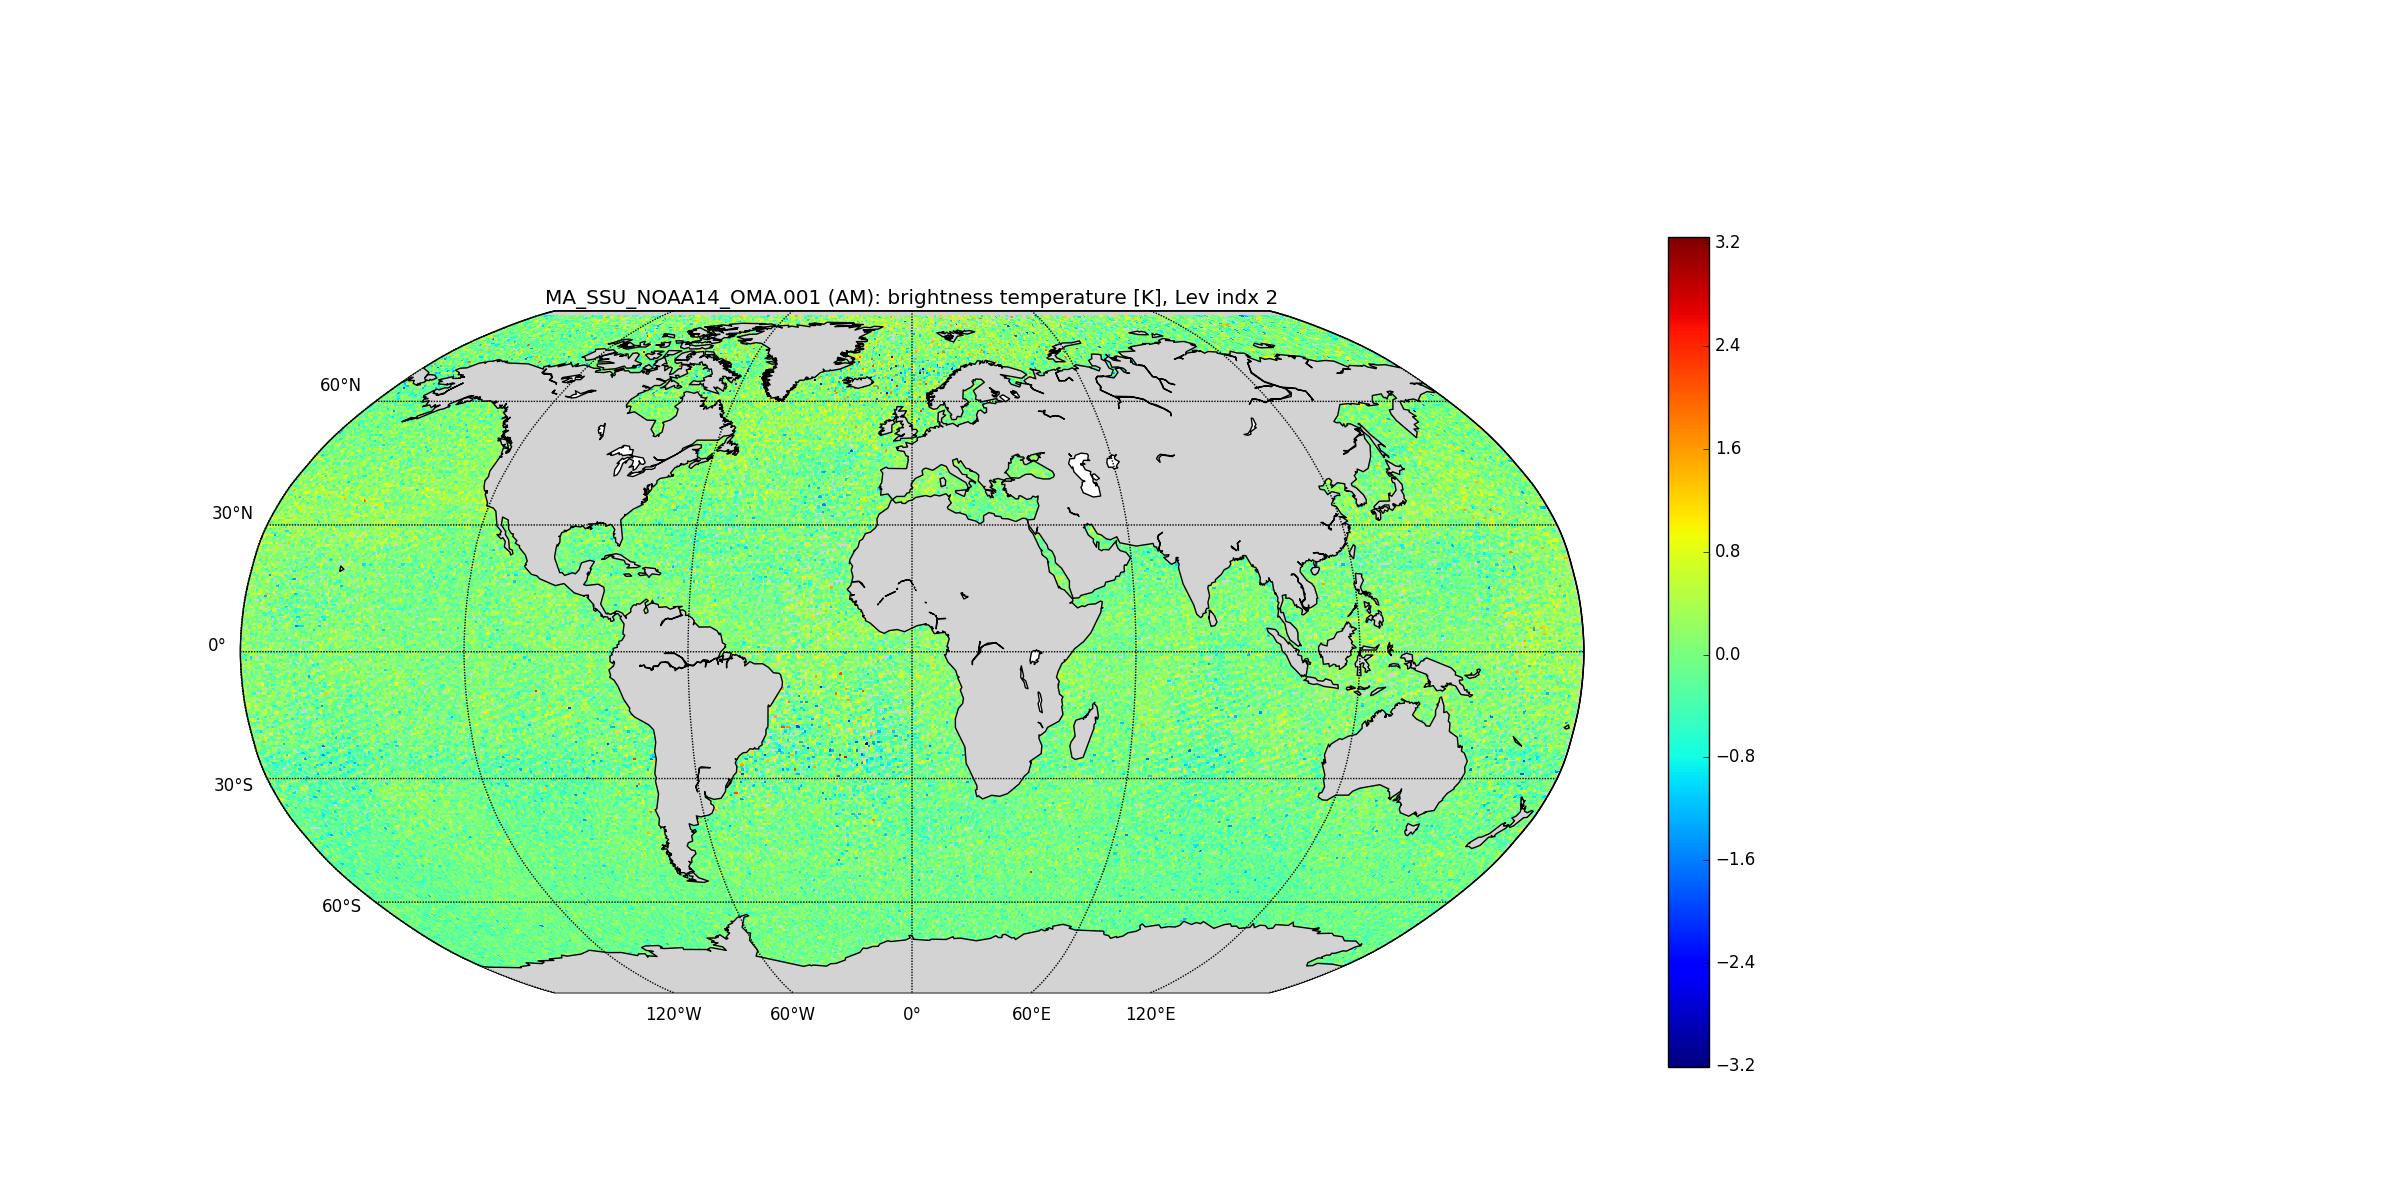 MA_SSU_NOAA14_OMA variable